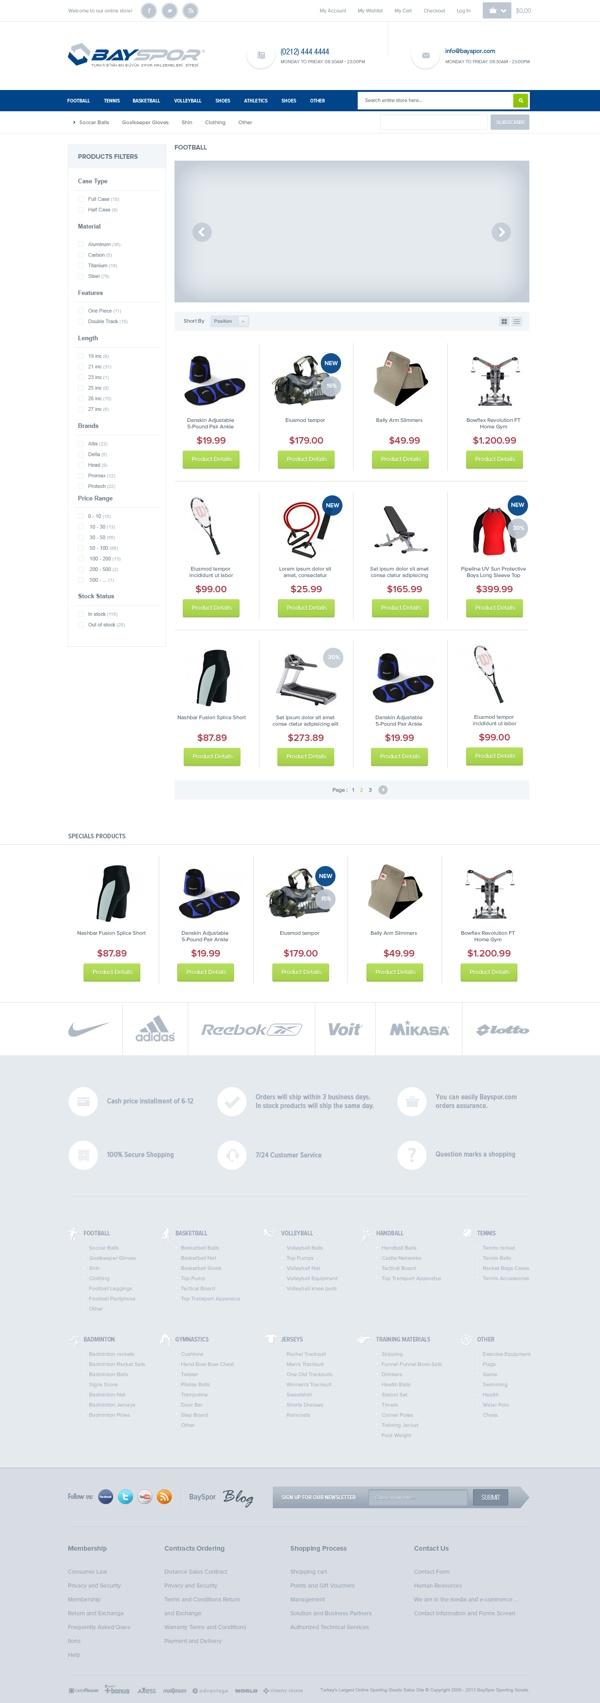 Sports Equipment E Commerce Theme by Emrah Demirağ, via Behance